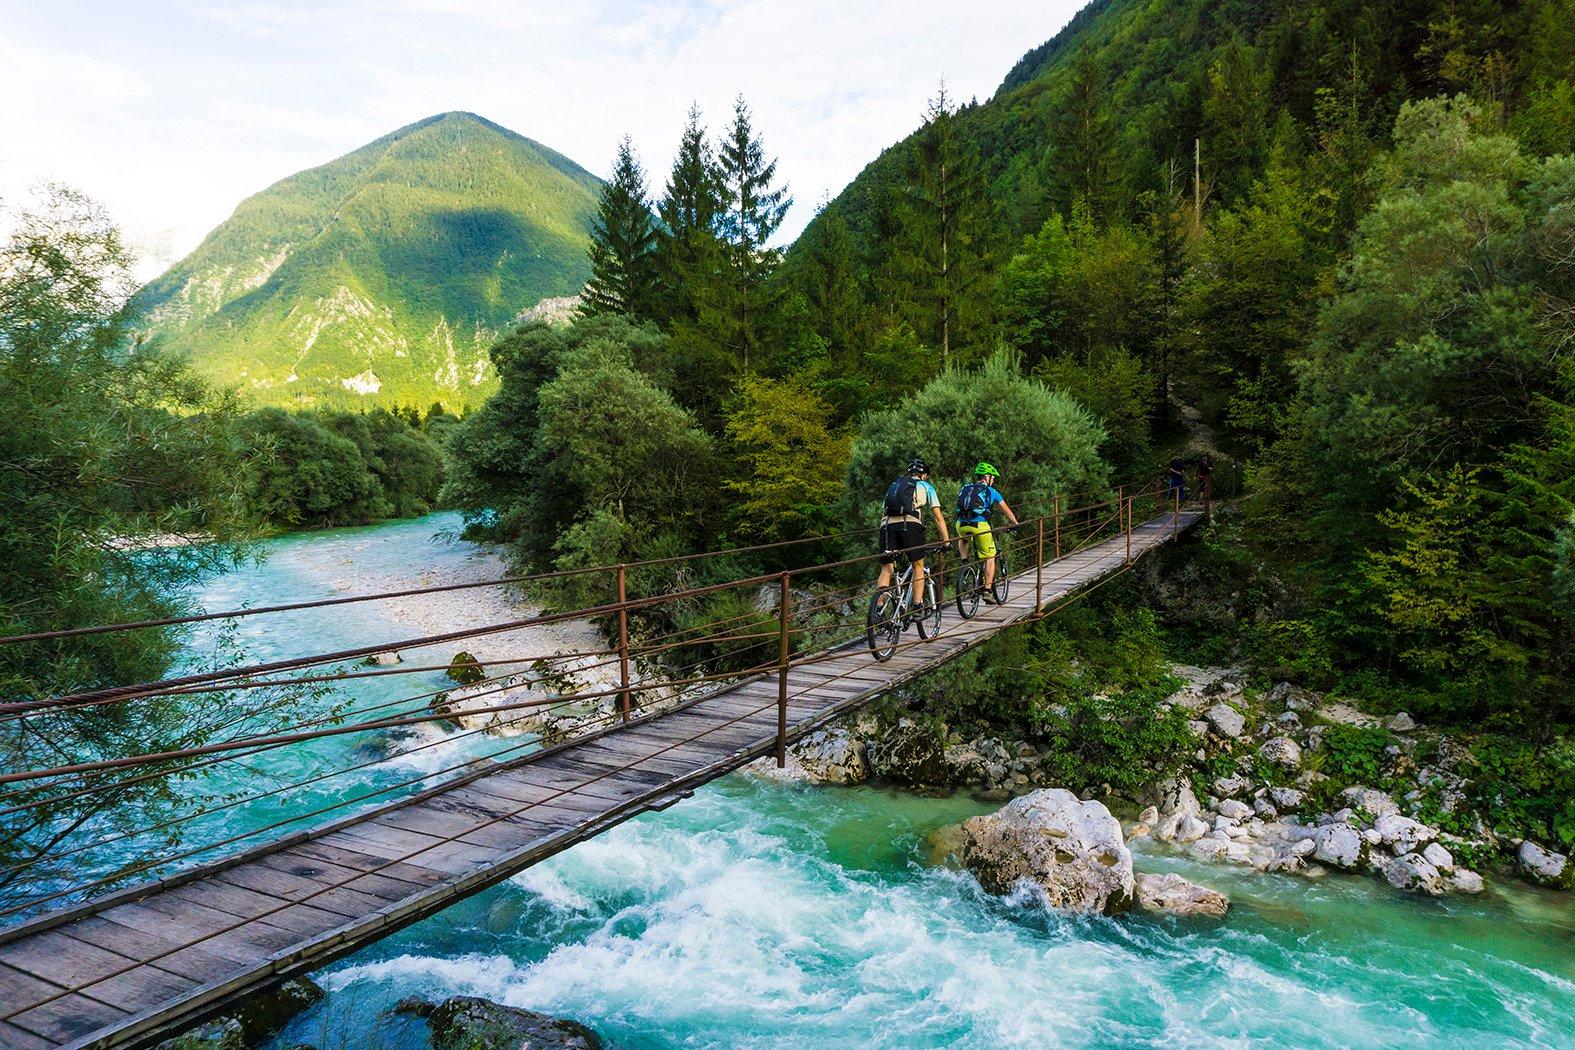 Visit_Goodplace_Uro___vigelj_Trans_Slovenia_01__92